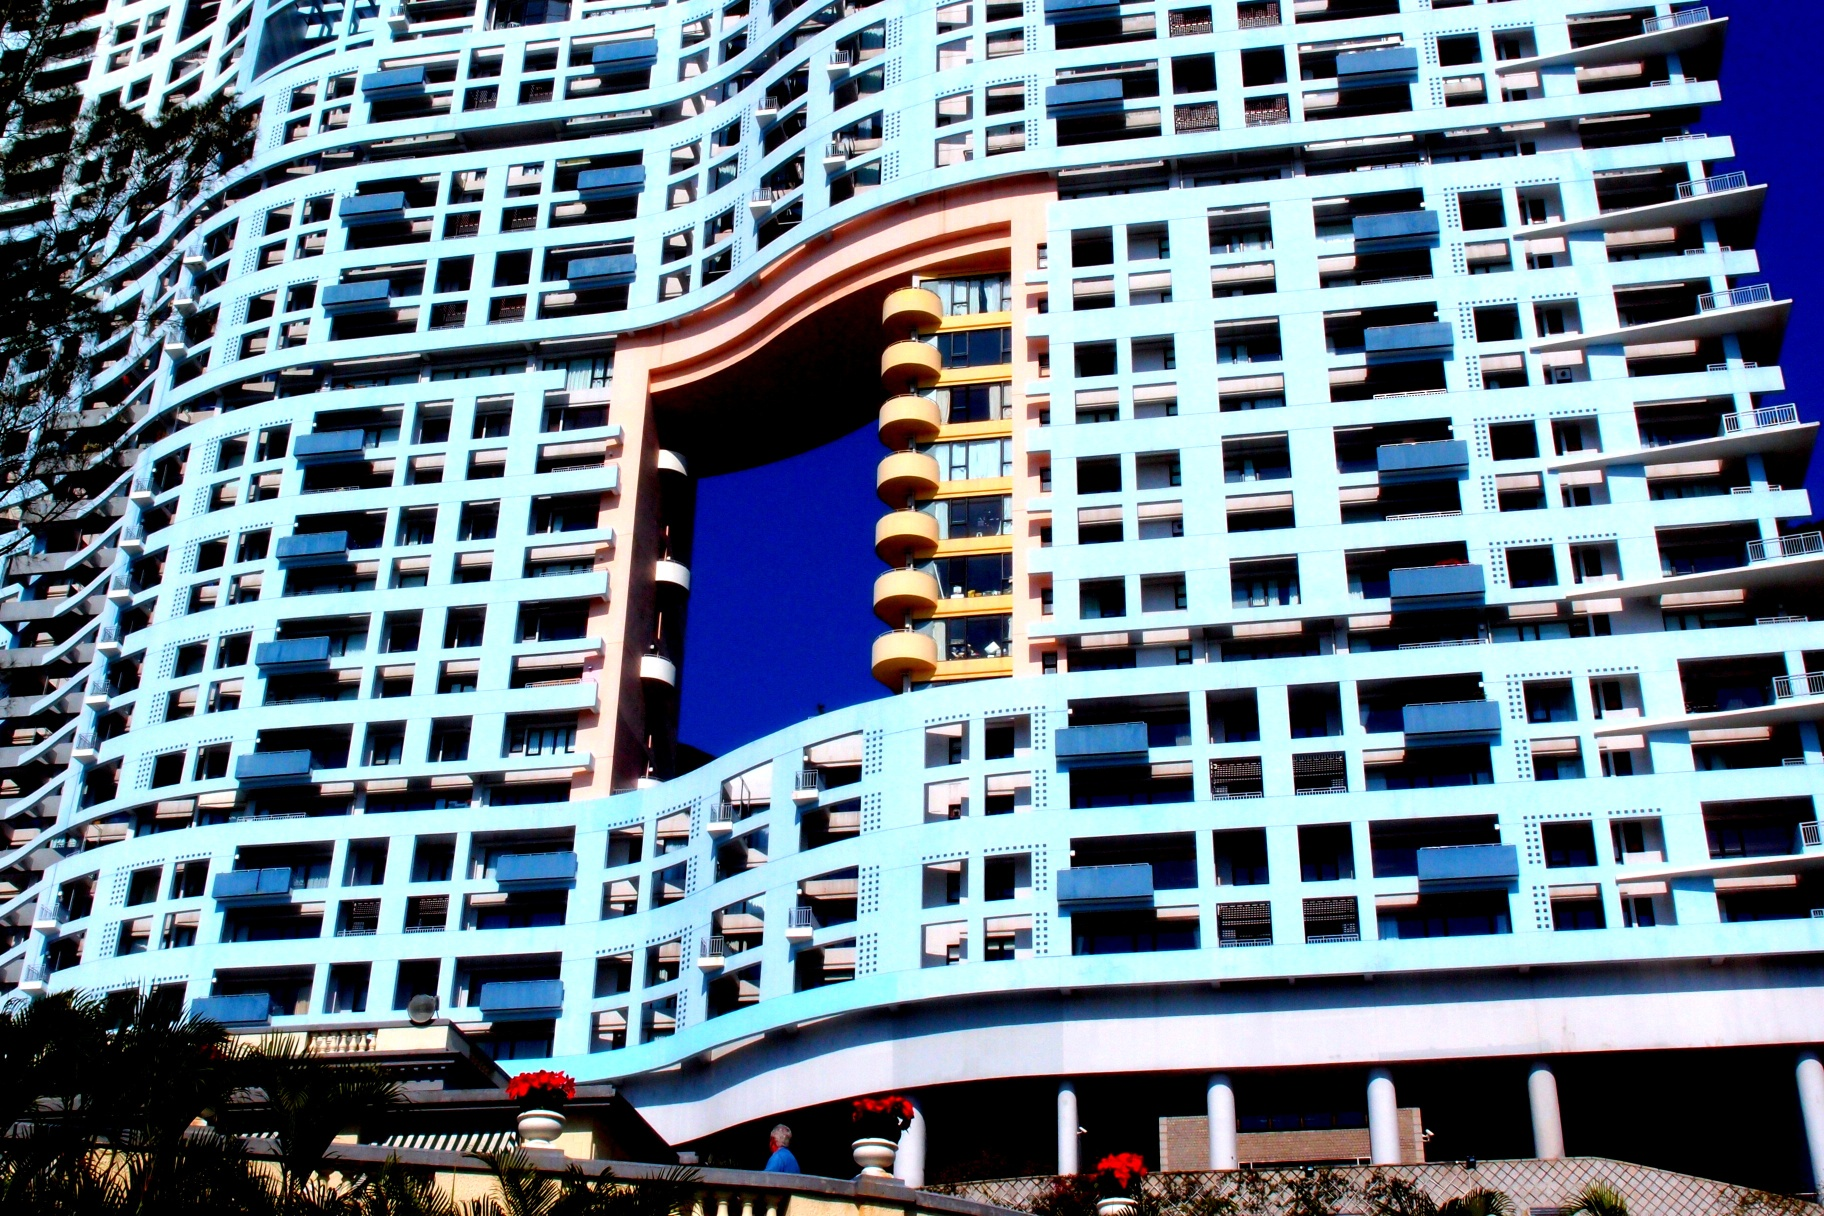 The Repulse Bay Apartments